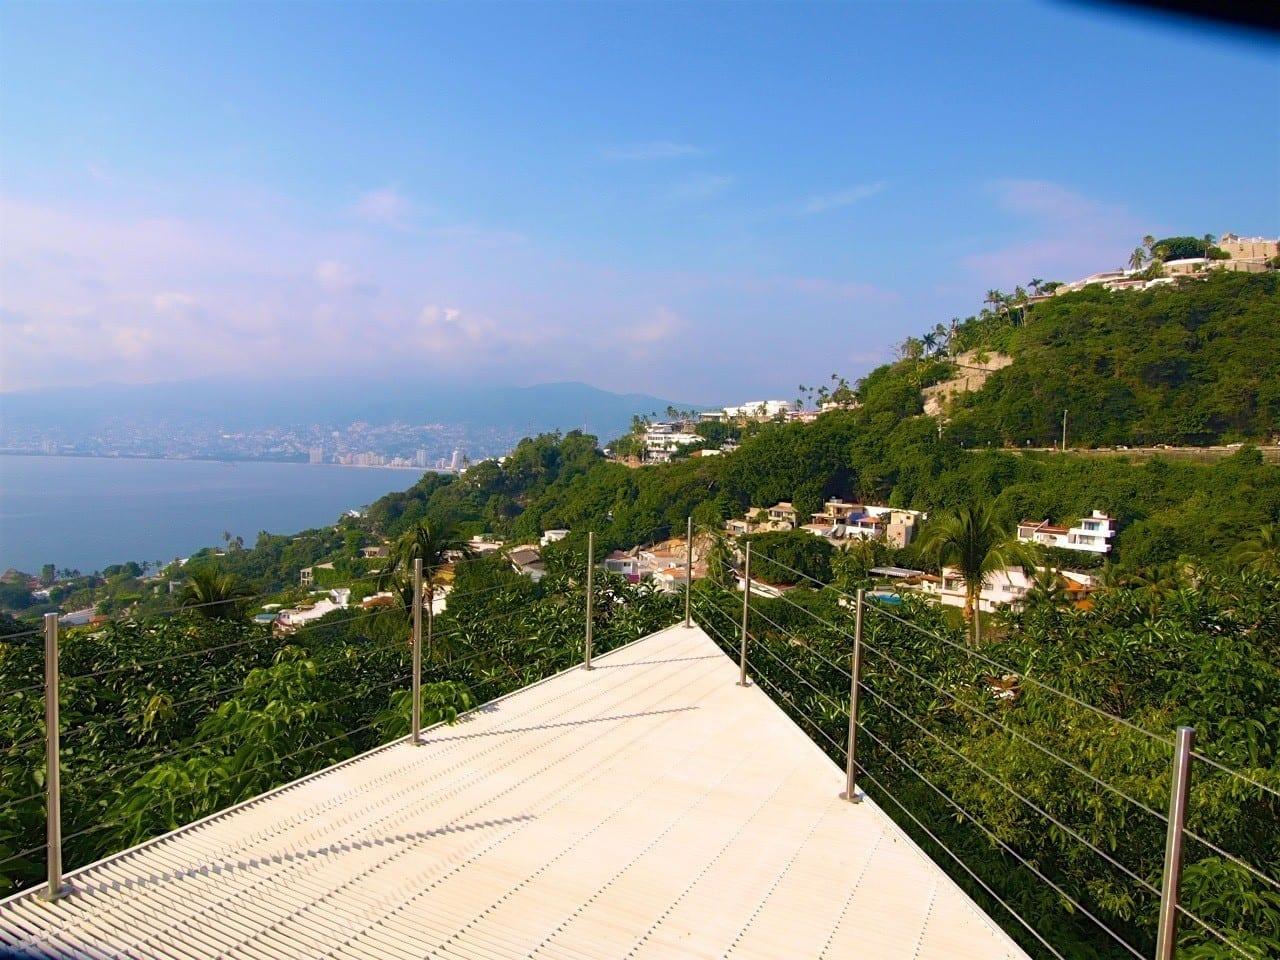 Arca Noe Acapulco